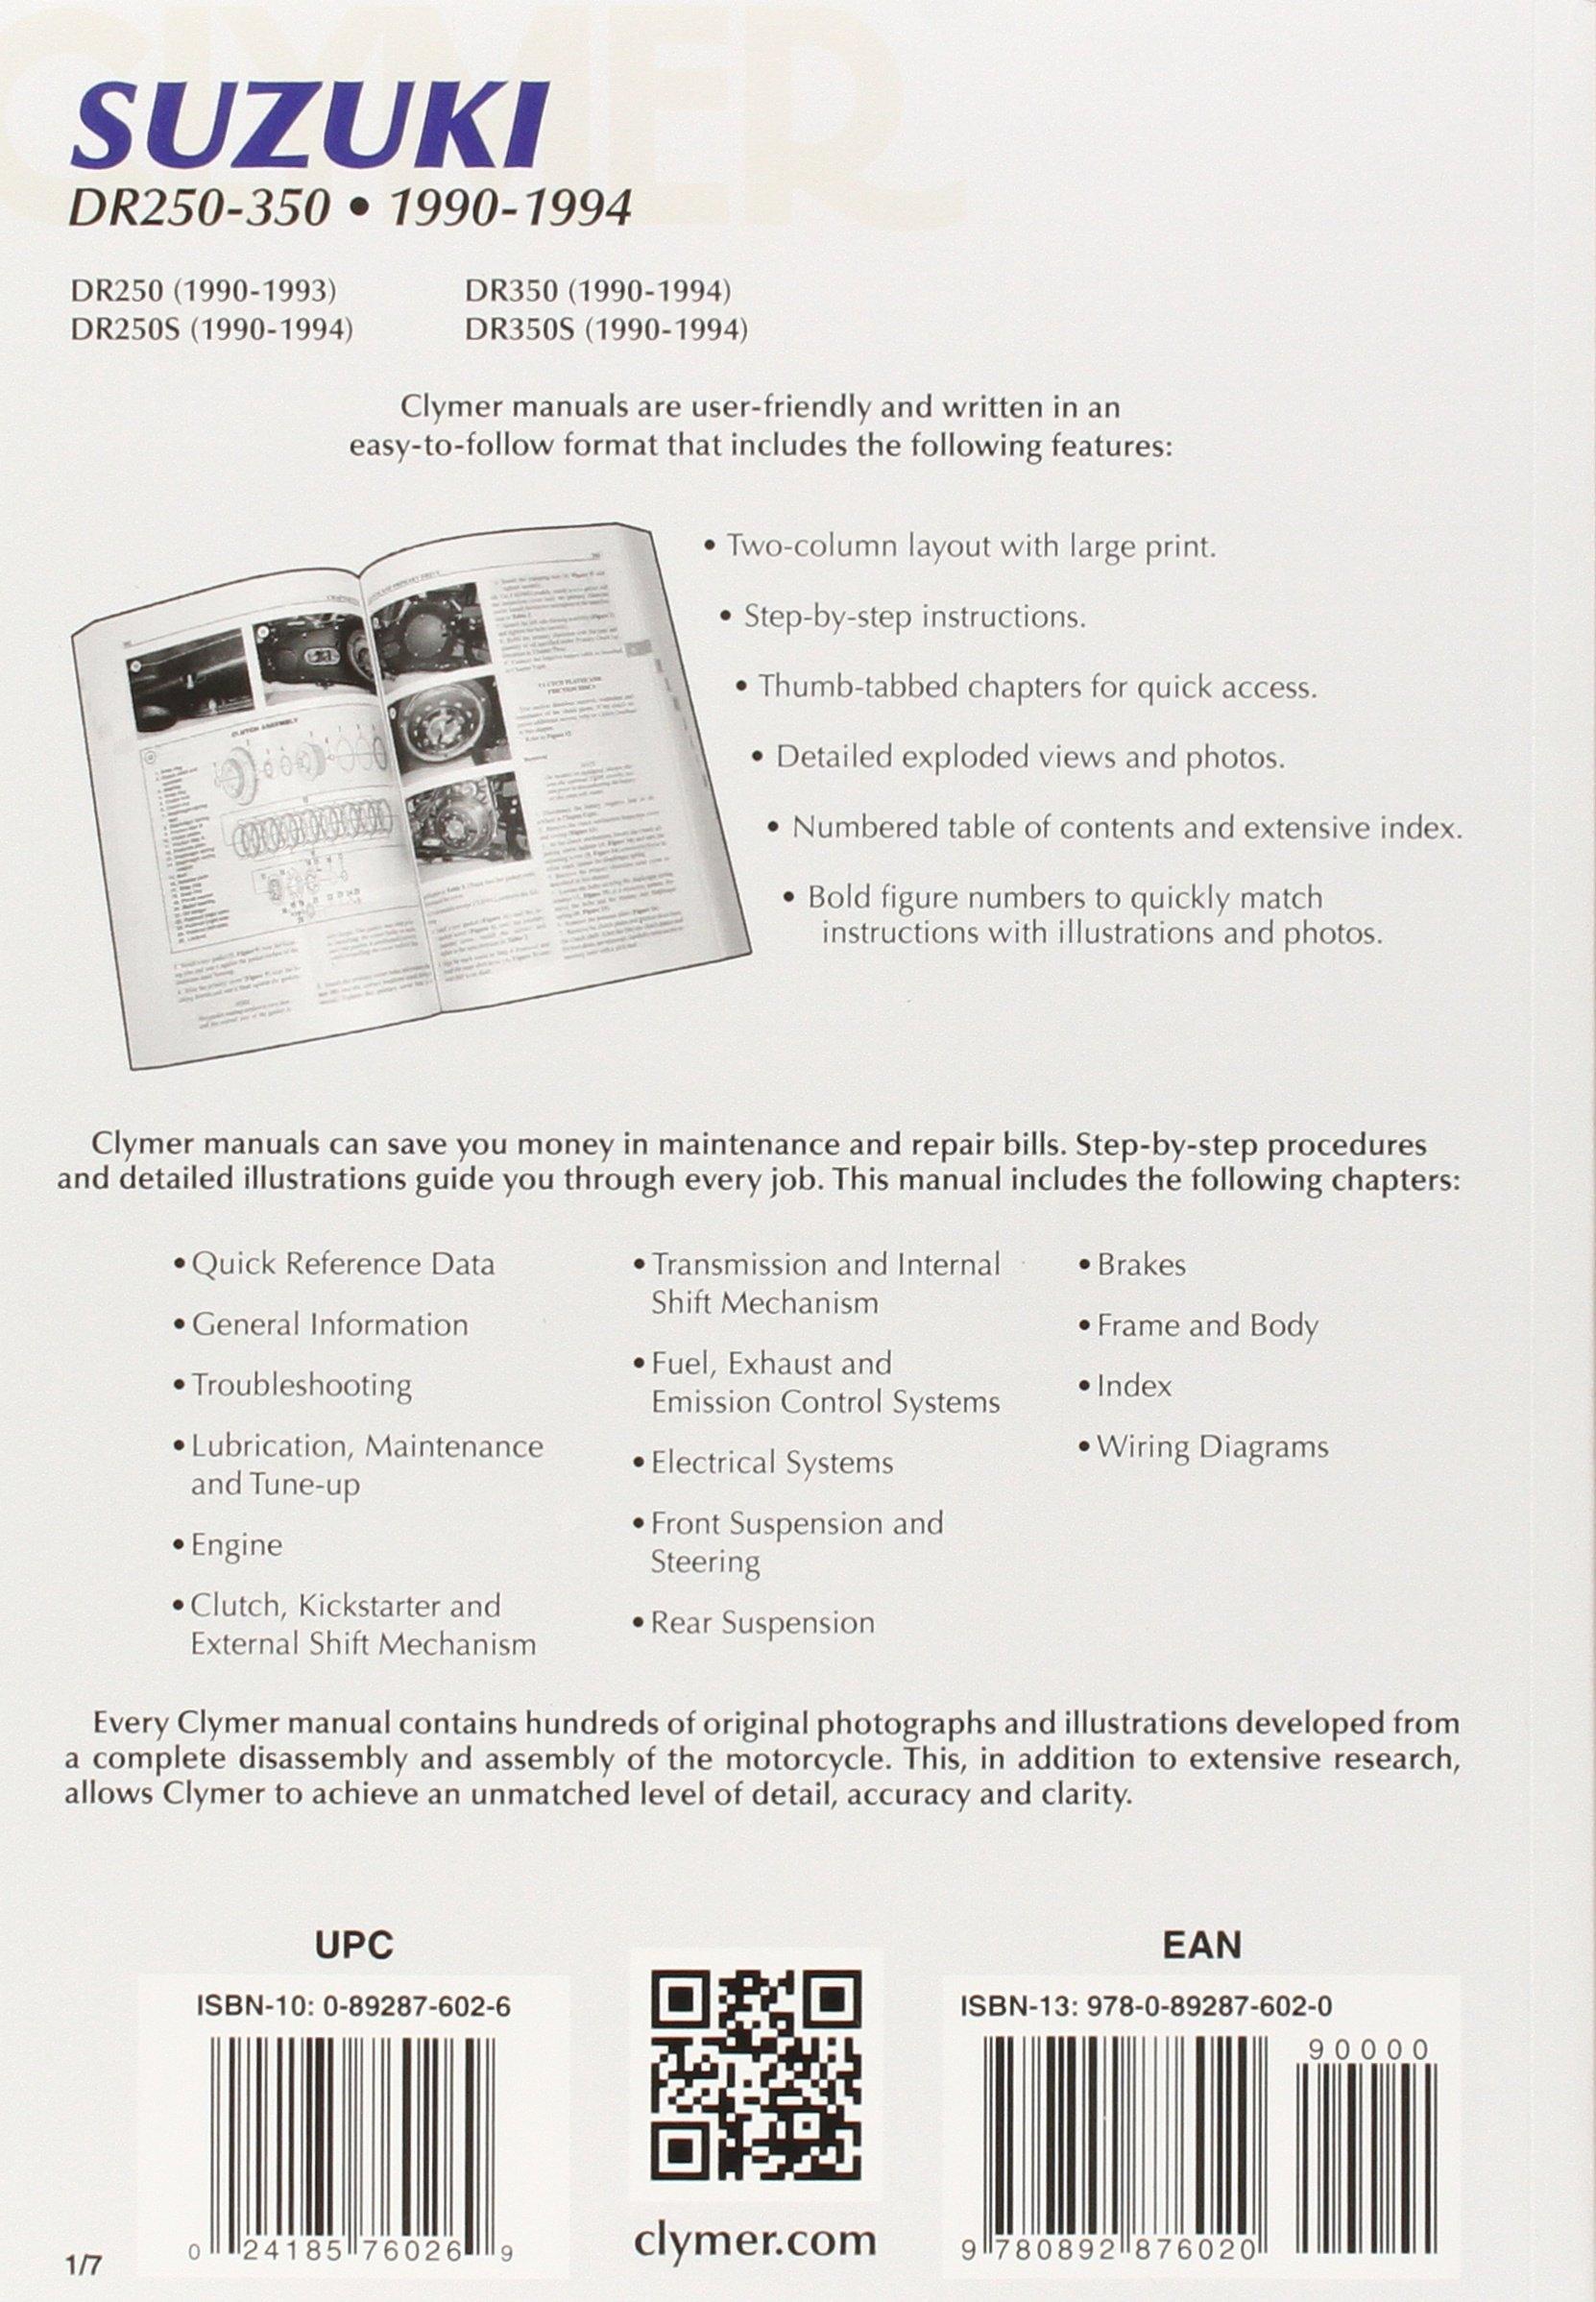 Clymer Suzuki DR250-350, 1990-1994: Maintenance, Troubleshooting, Repair  (CLYMER MOTORCYCLE REPAIR): Penton Staff: 9780892876020: Amazon.com: Books